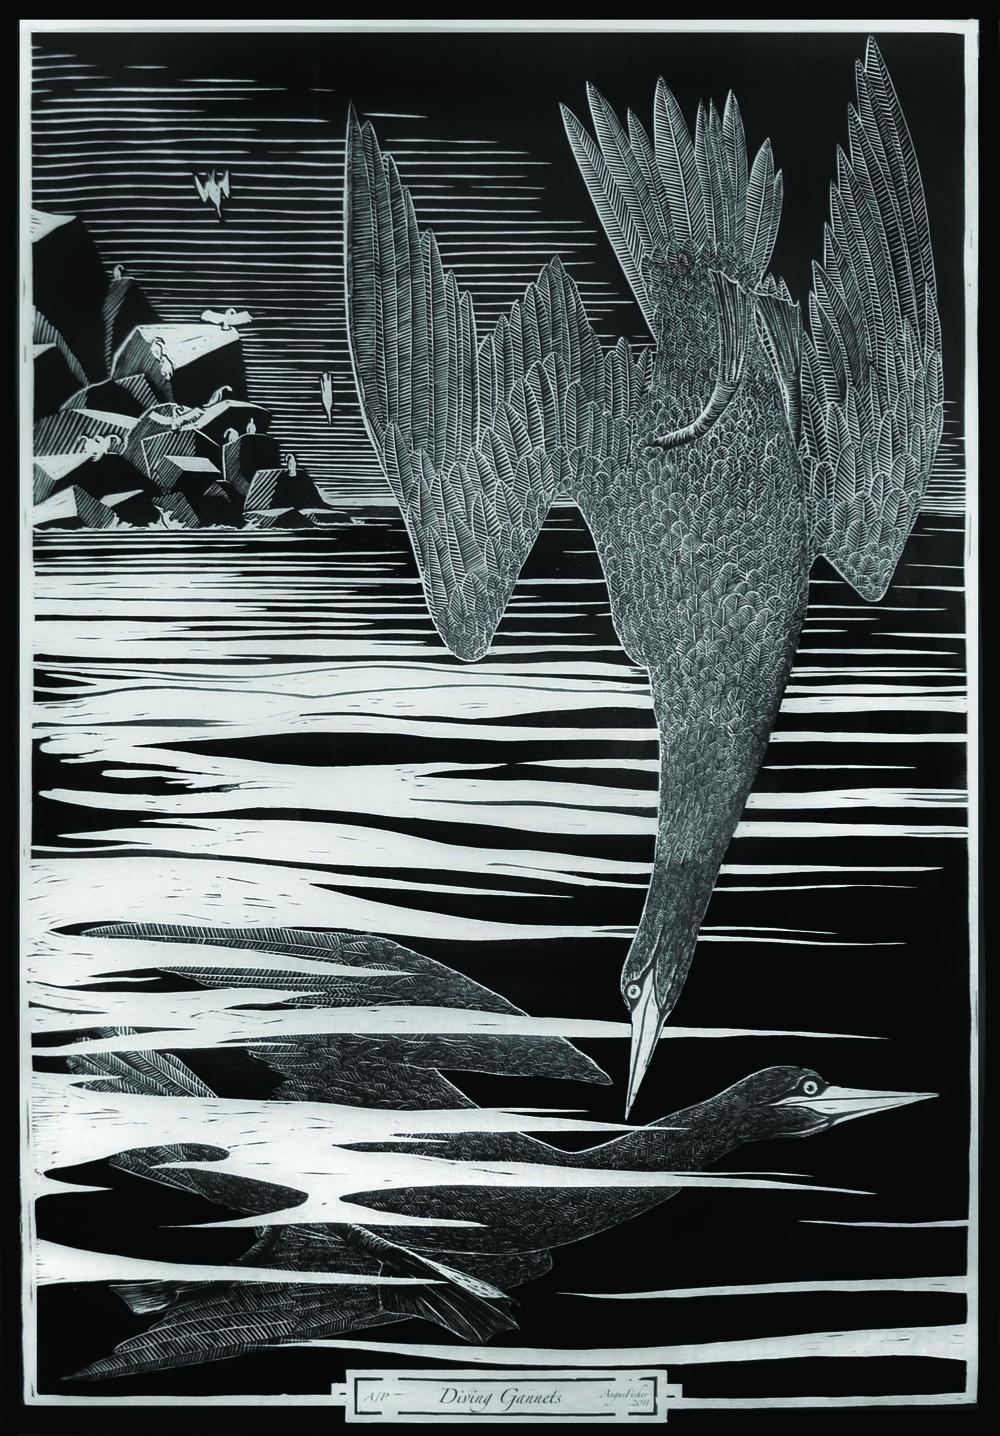 'Diving Gannets'